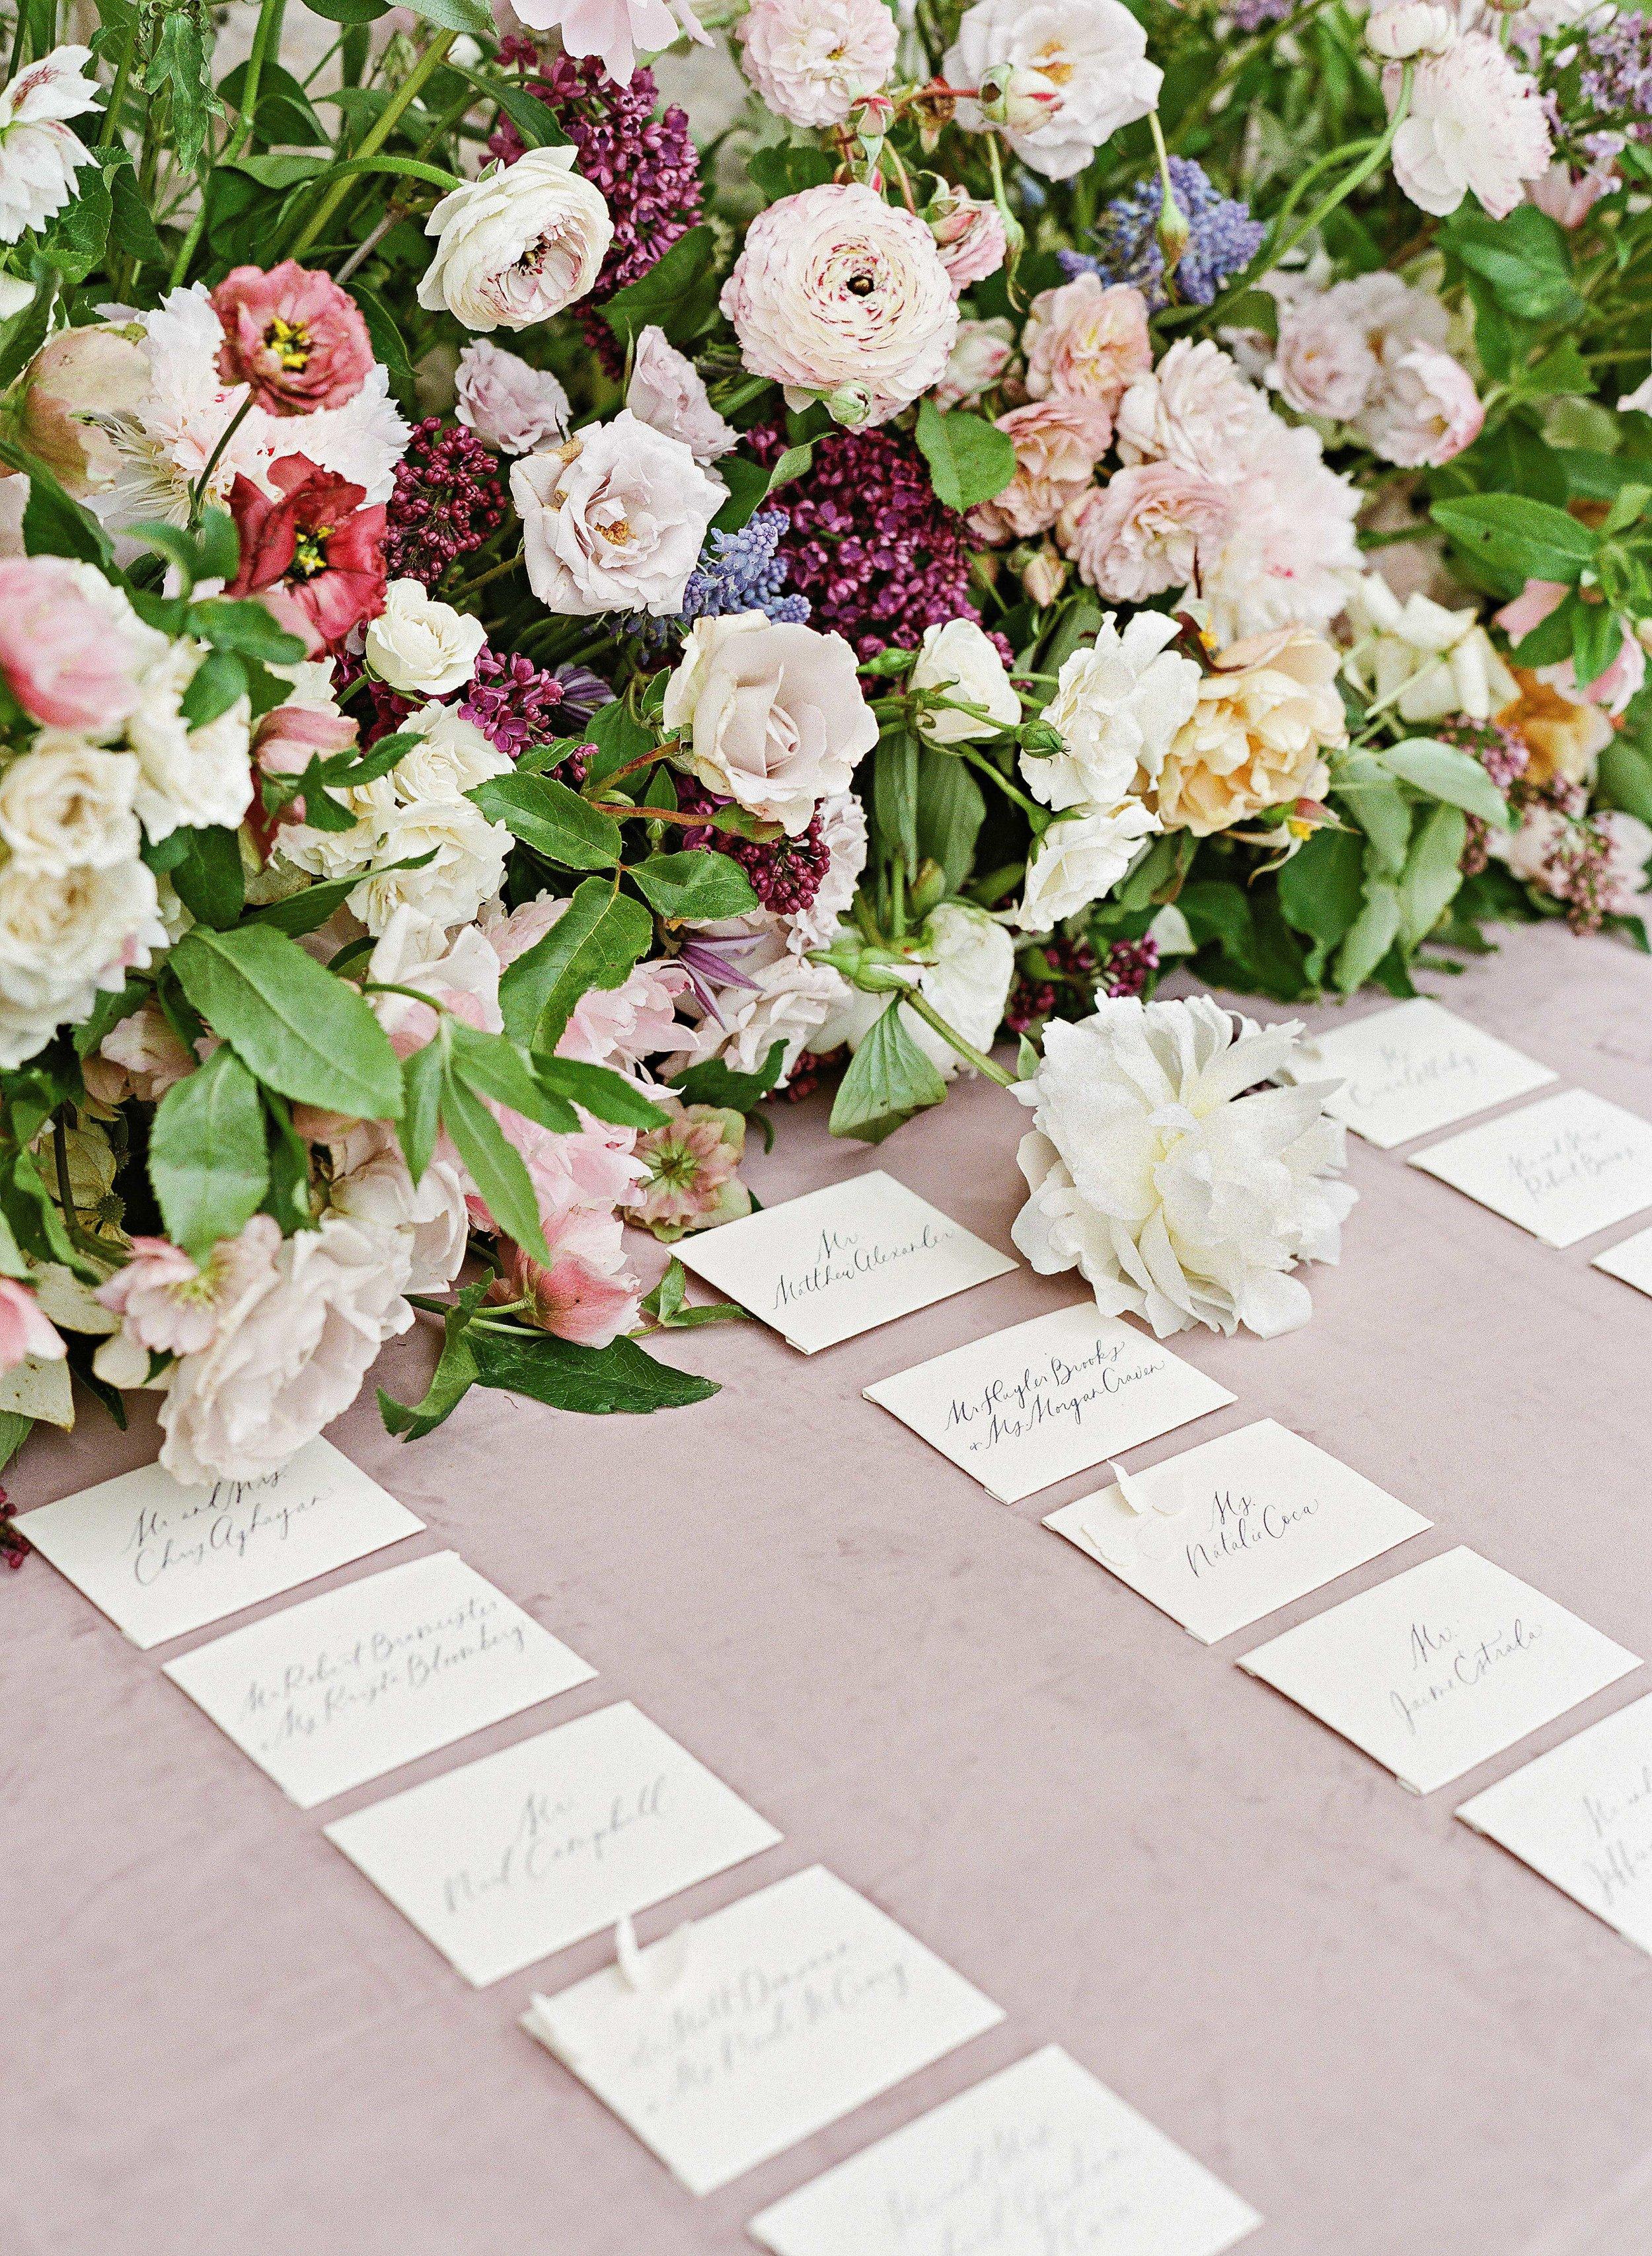 rebecca-clay-wedding-north-carolina-escort-cards-103228808.jpg